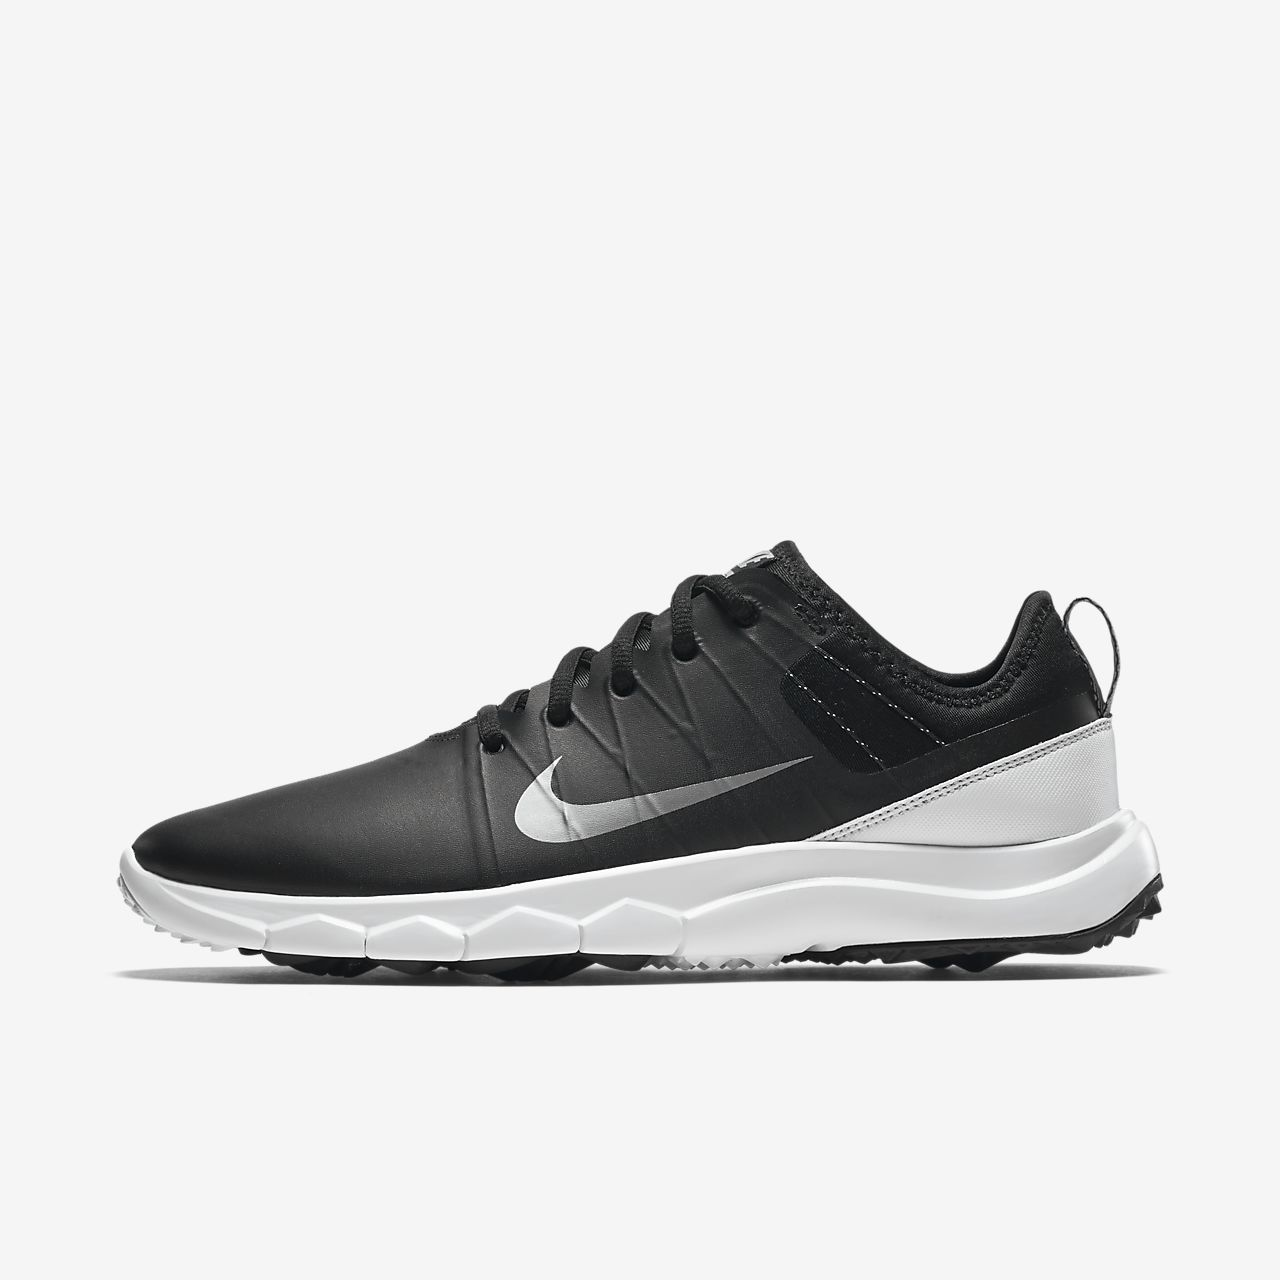 quality design 7262c fcda0 ... Nike FI Impact 2 golfsko for dame